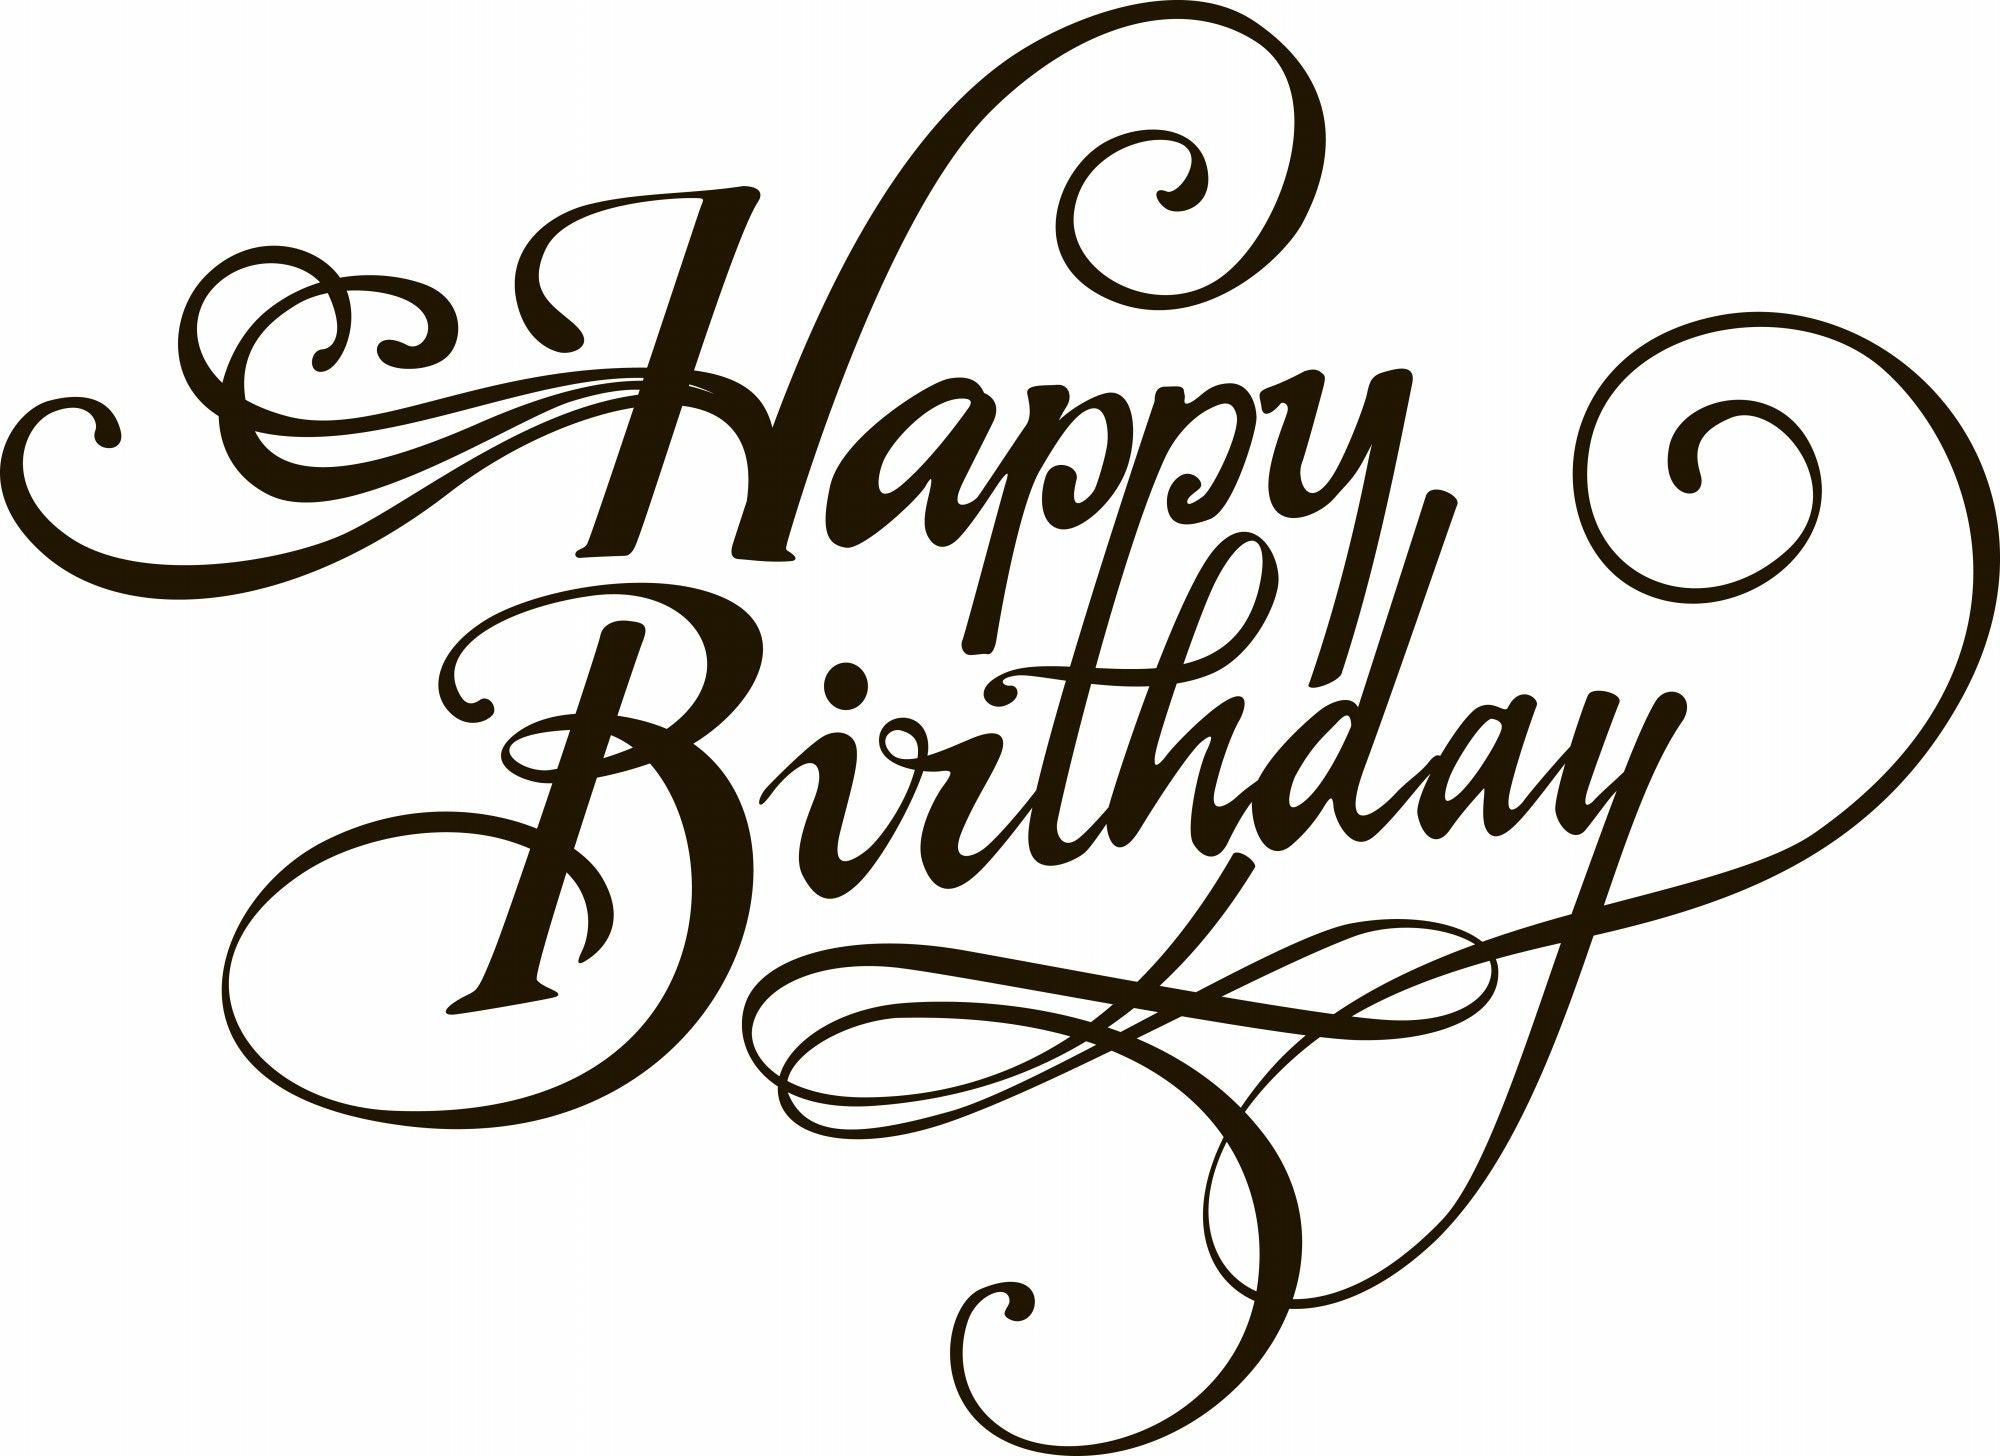 free birthday greeting card latest 16   Happy Birthday (Dec 13th